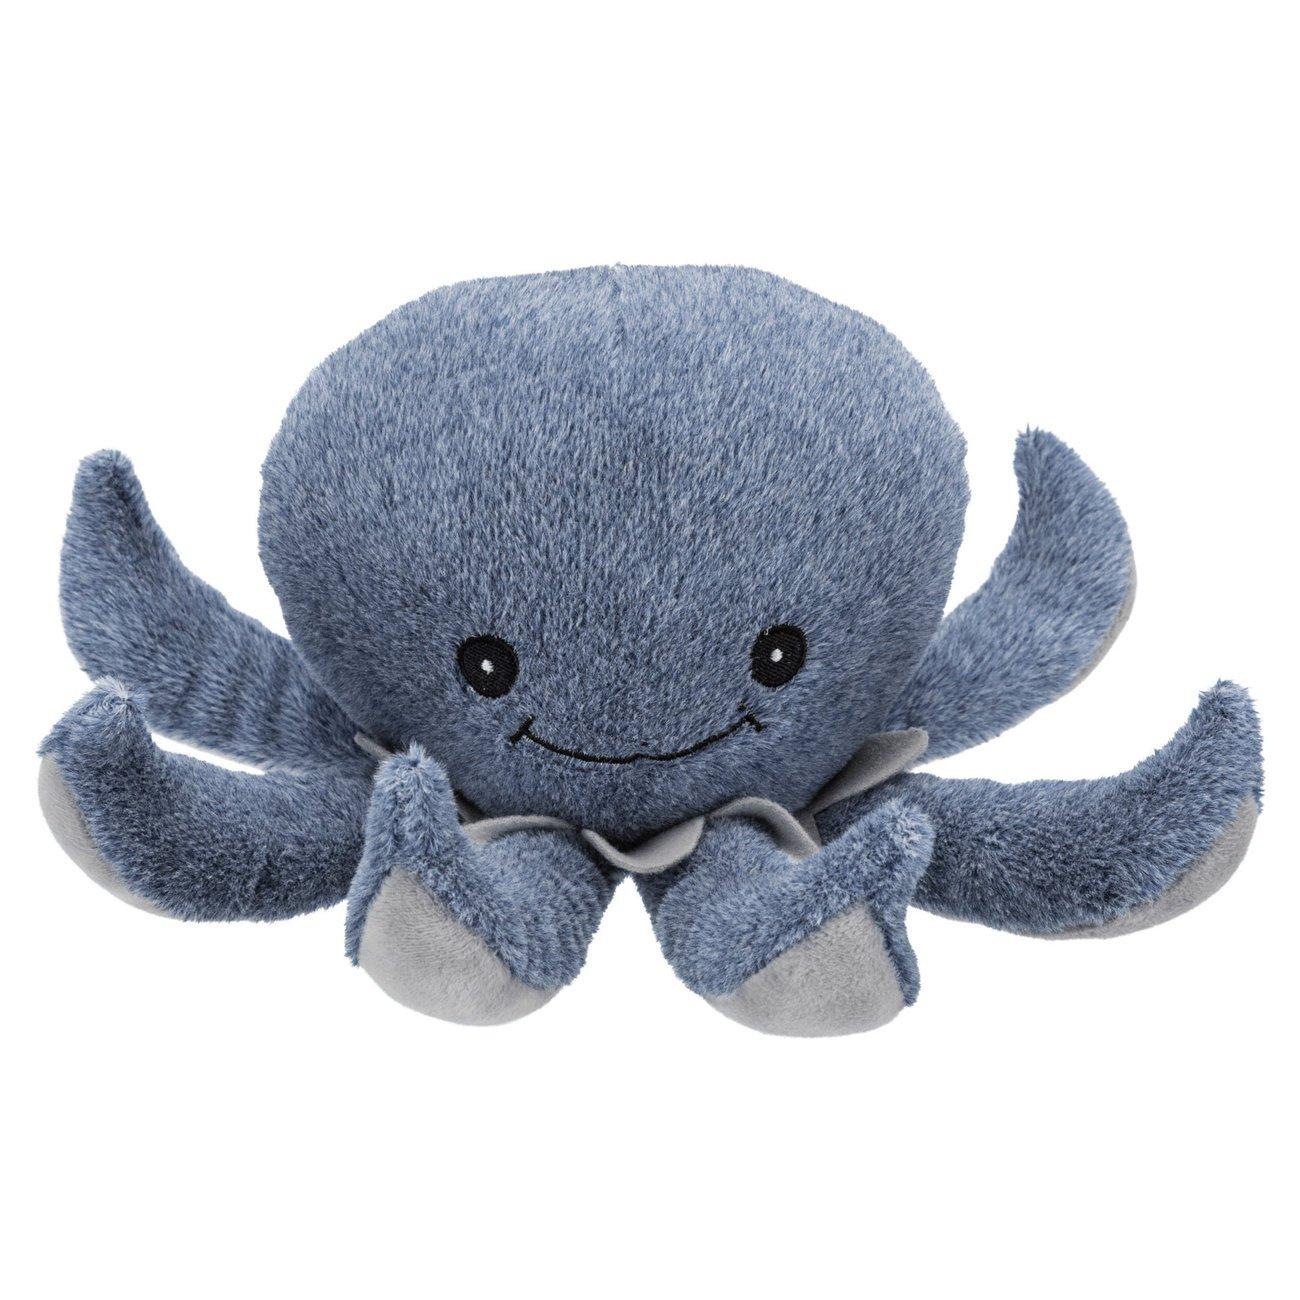 TRIXIE BE NORDIC Octopus Ocke, Hundespielzeug 36043, Bild 3